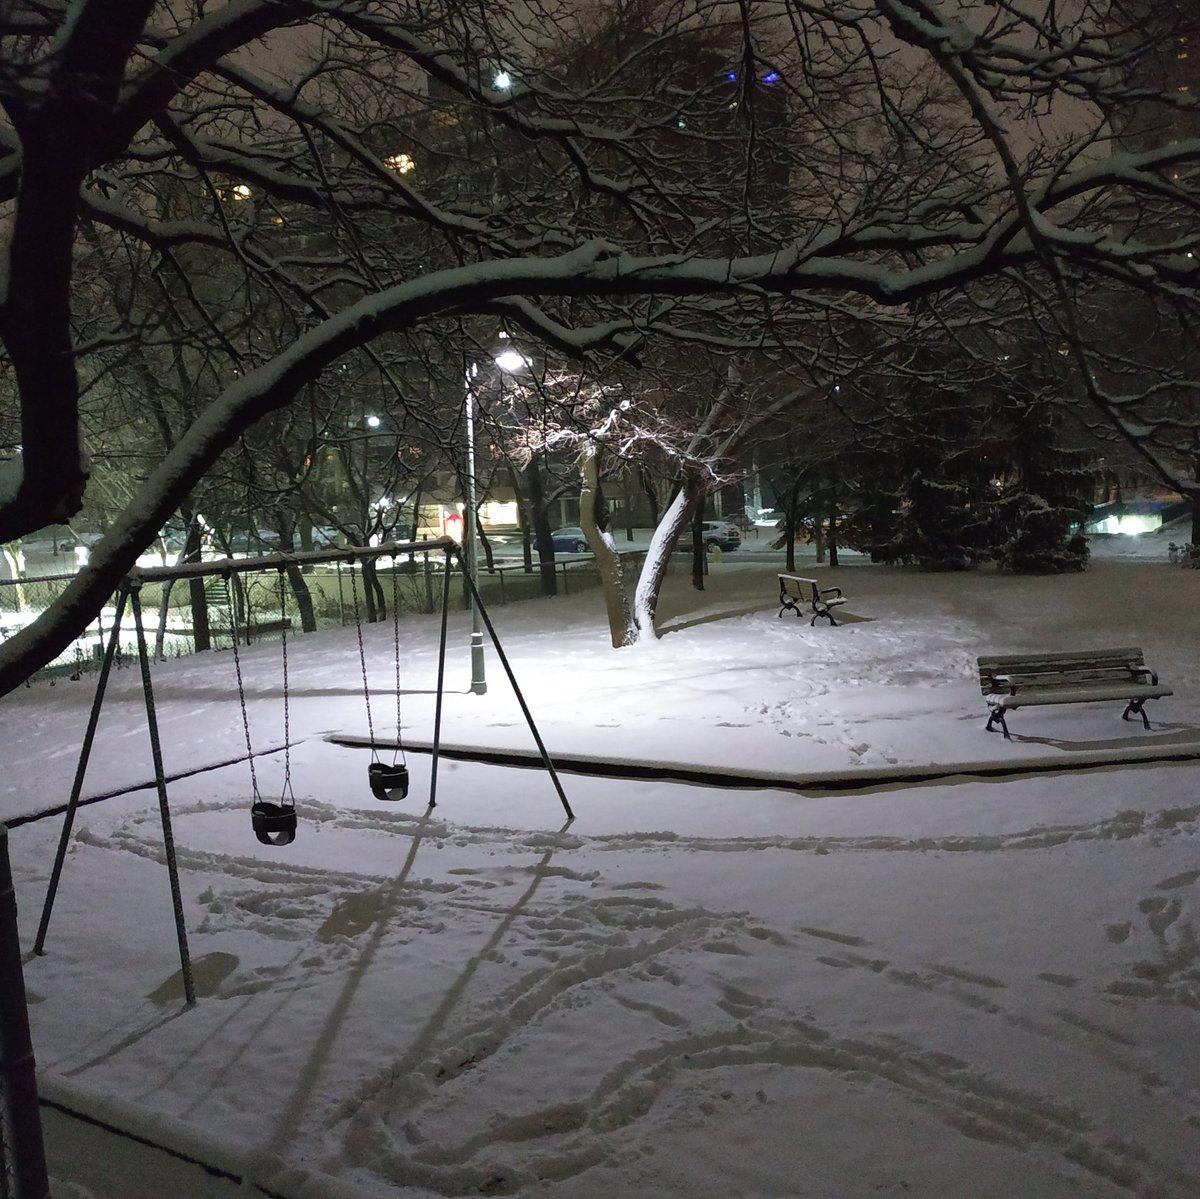 The park tonight has a sense of peace about it. #winter #winterwonderland #park #snowypark #eveningscene #winterinthecity pic.twitter.com/Gy5rgguI0P